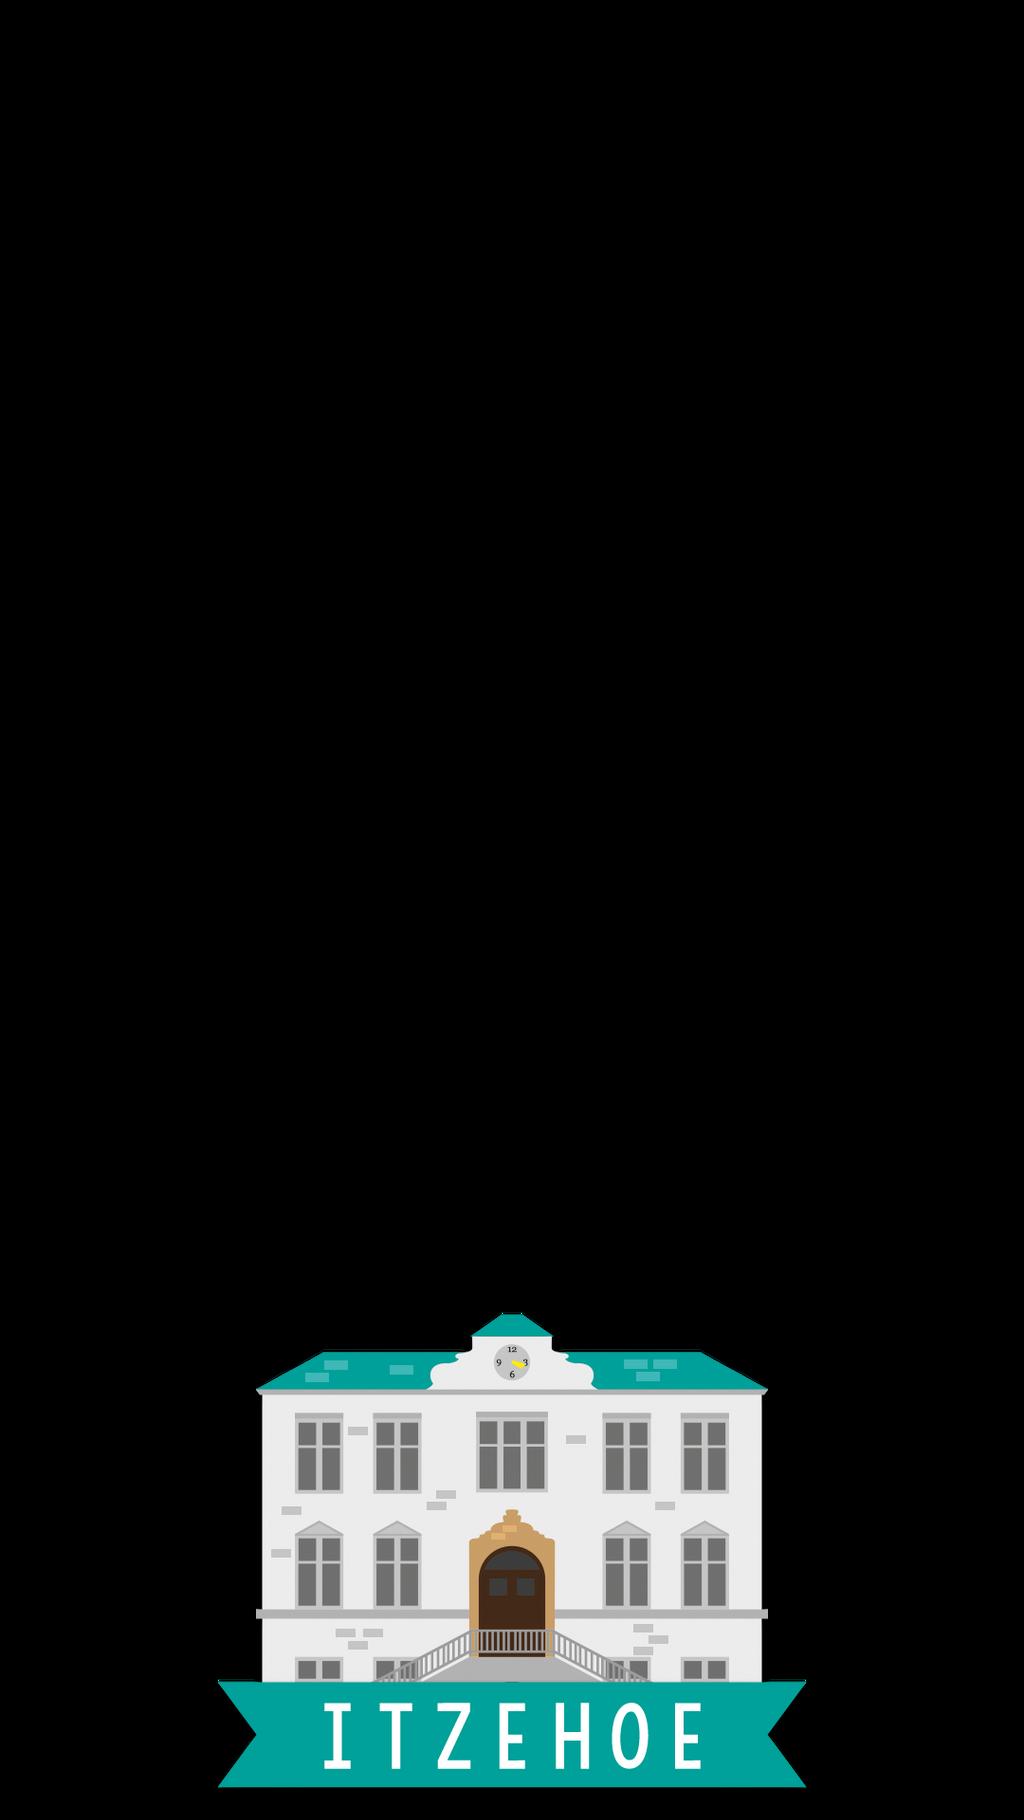 Snapchat Geofilter: Itzehoe by Raion1337